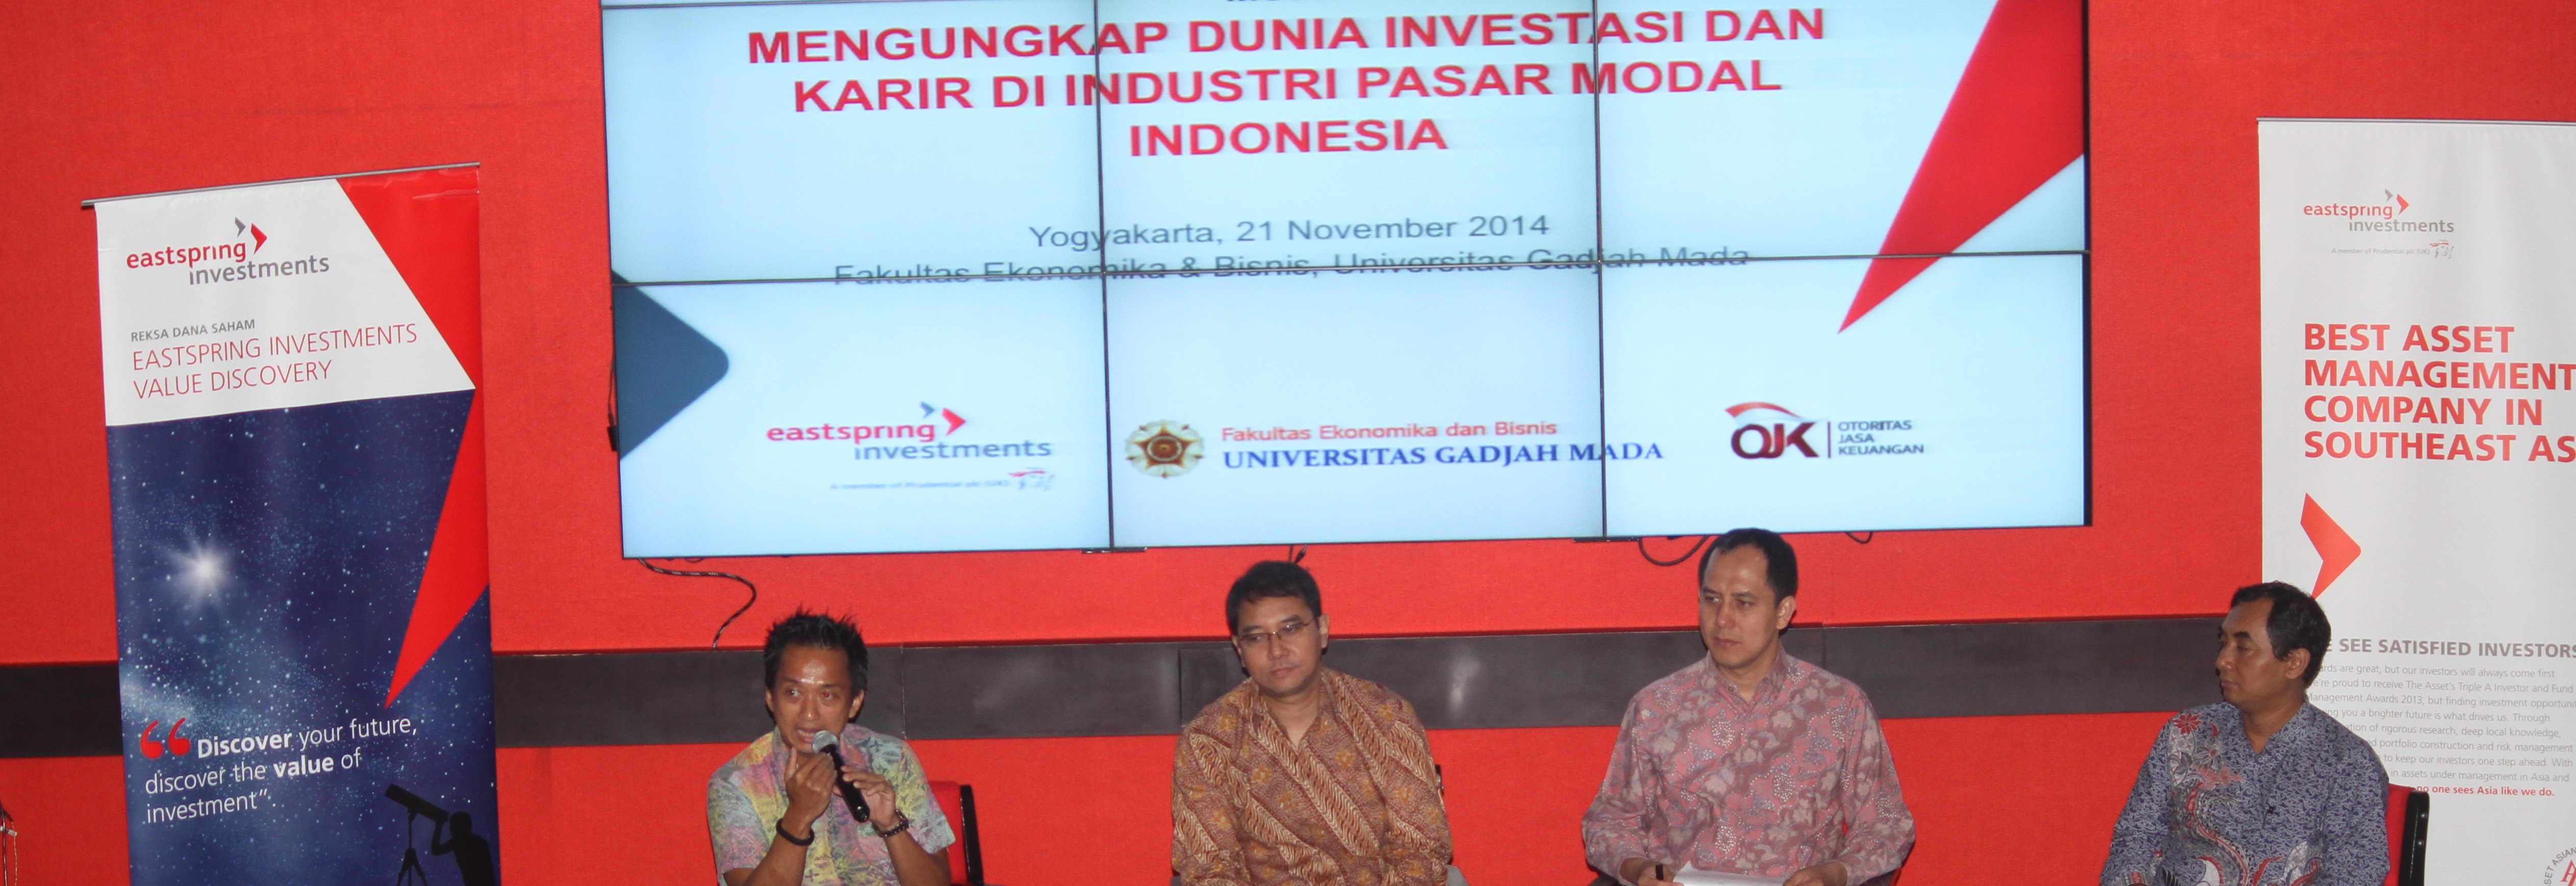 Eastspring Tour de Campus 2014 - Universitas Gadjah Mada Yogyakarta